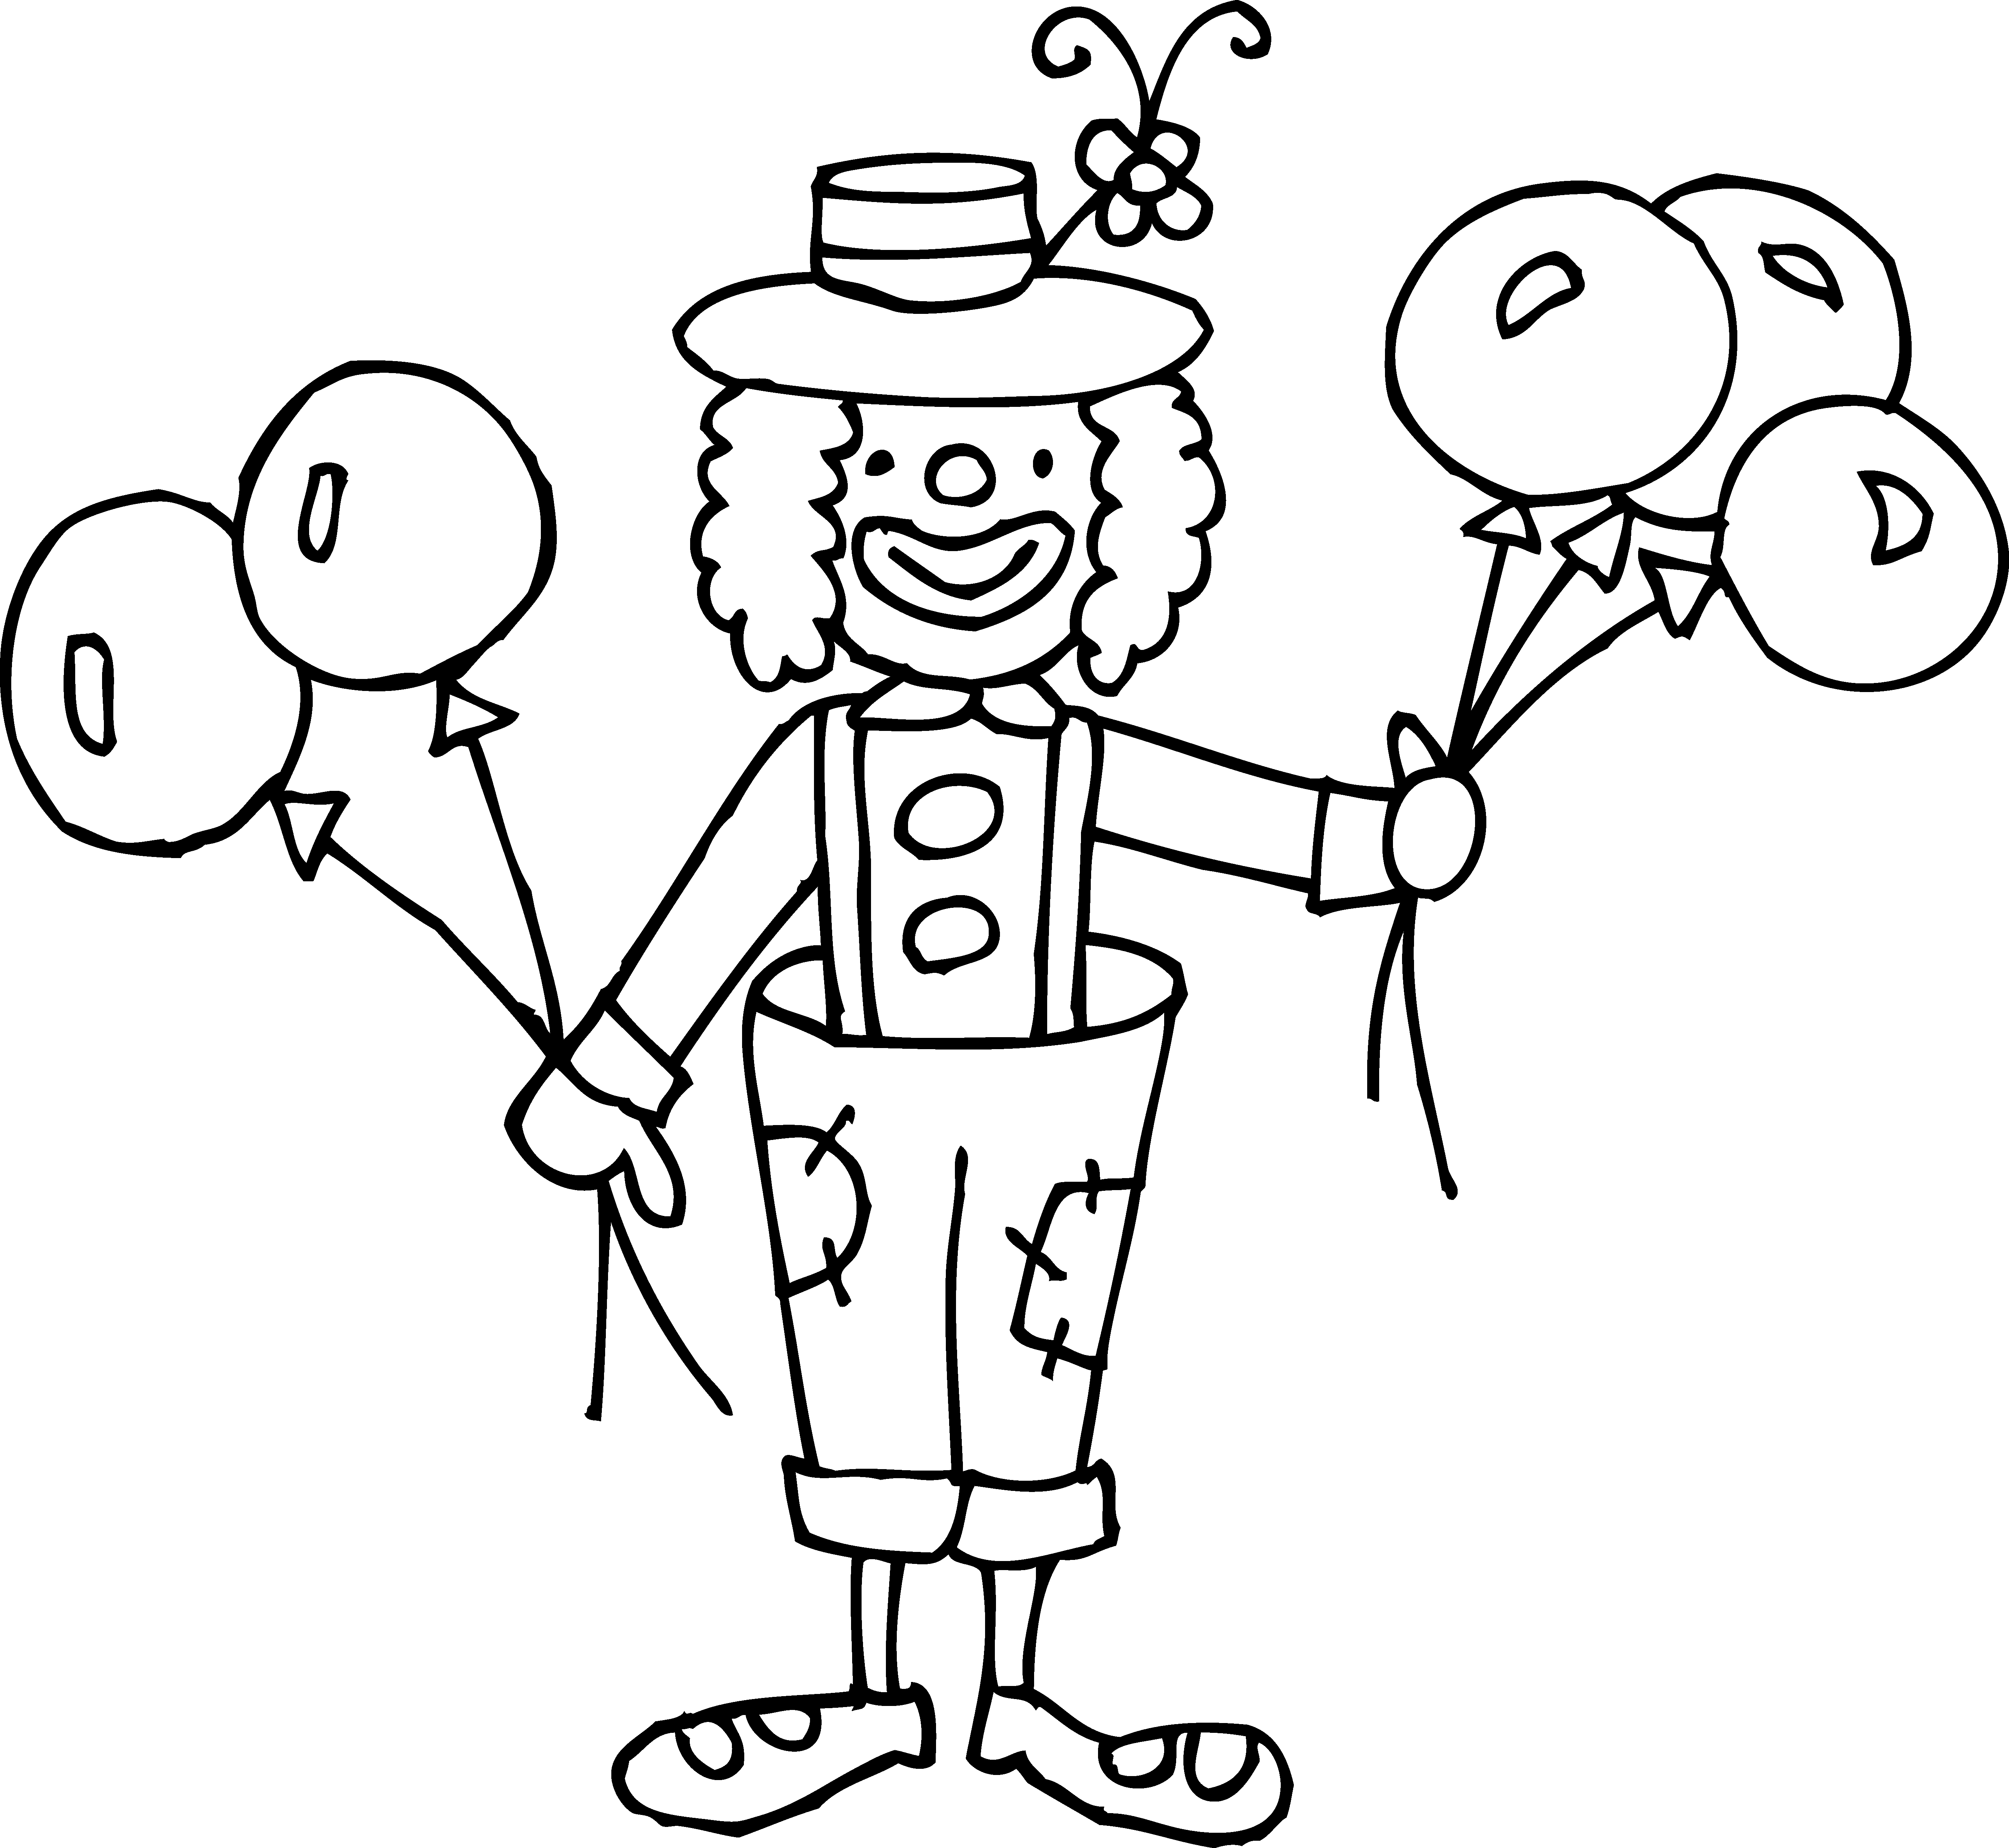 Fun clipart black and white  And Clipart Black Clown